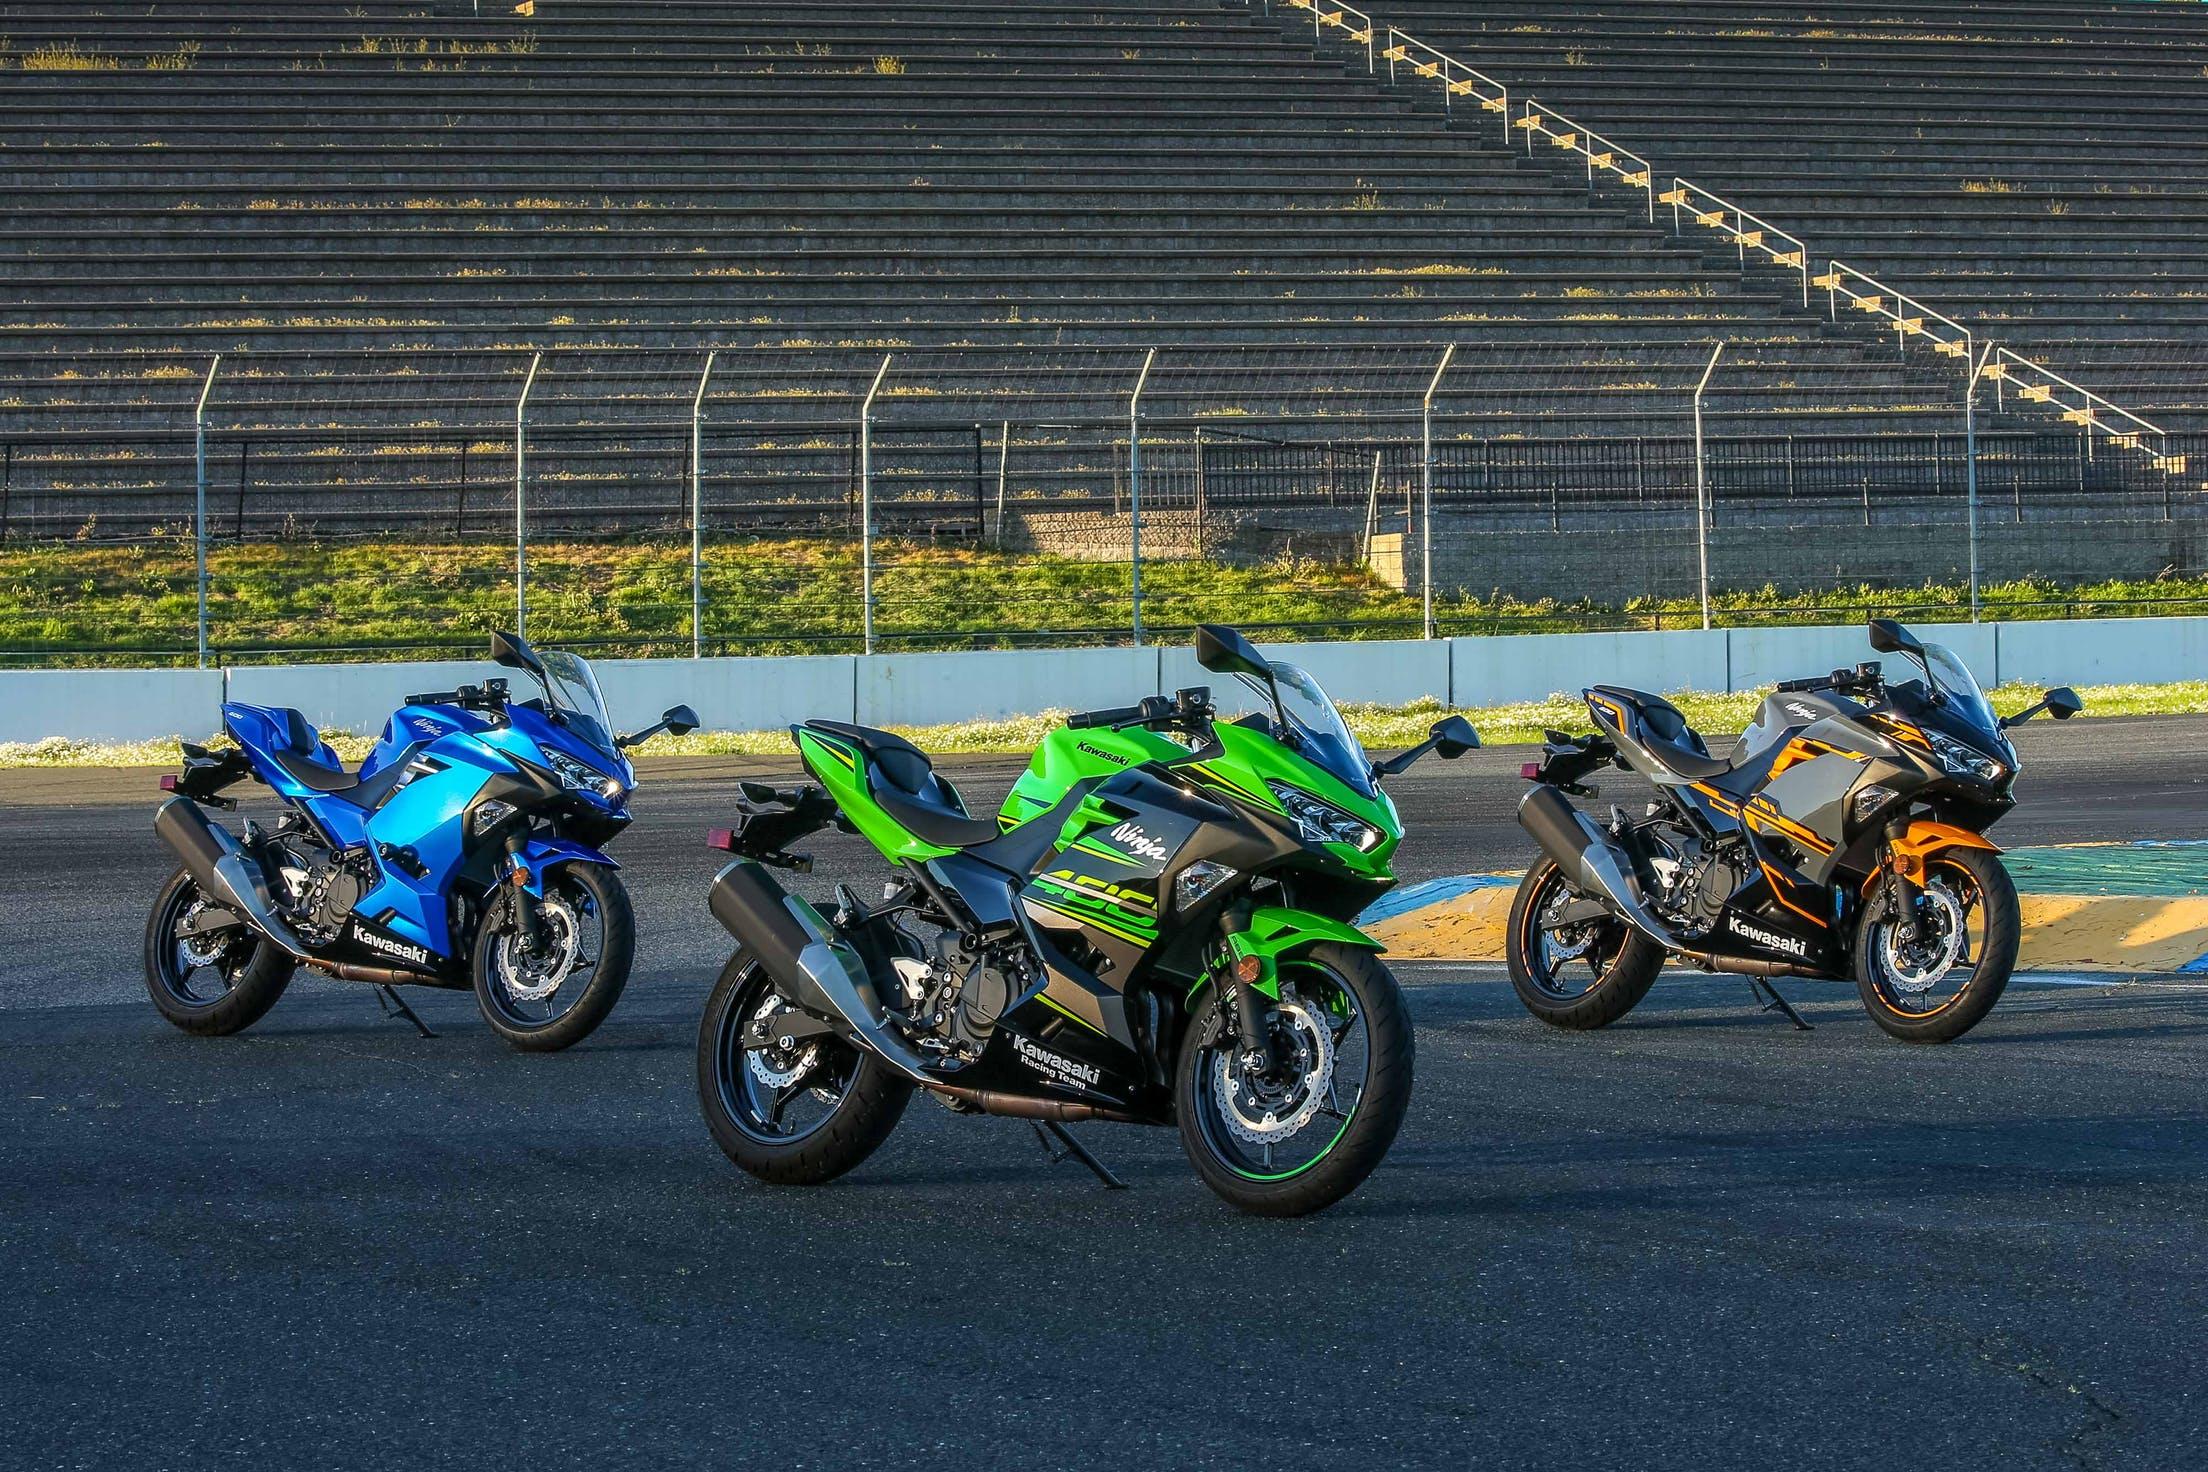 Motorcycle Motorbike Protector Rain Cover For Kawasaki 500Cc Ninja